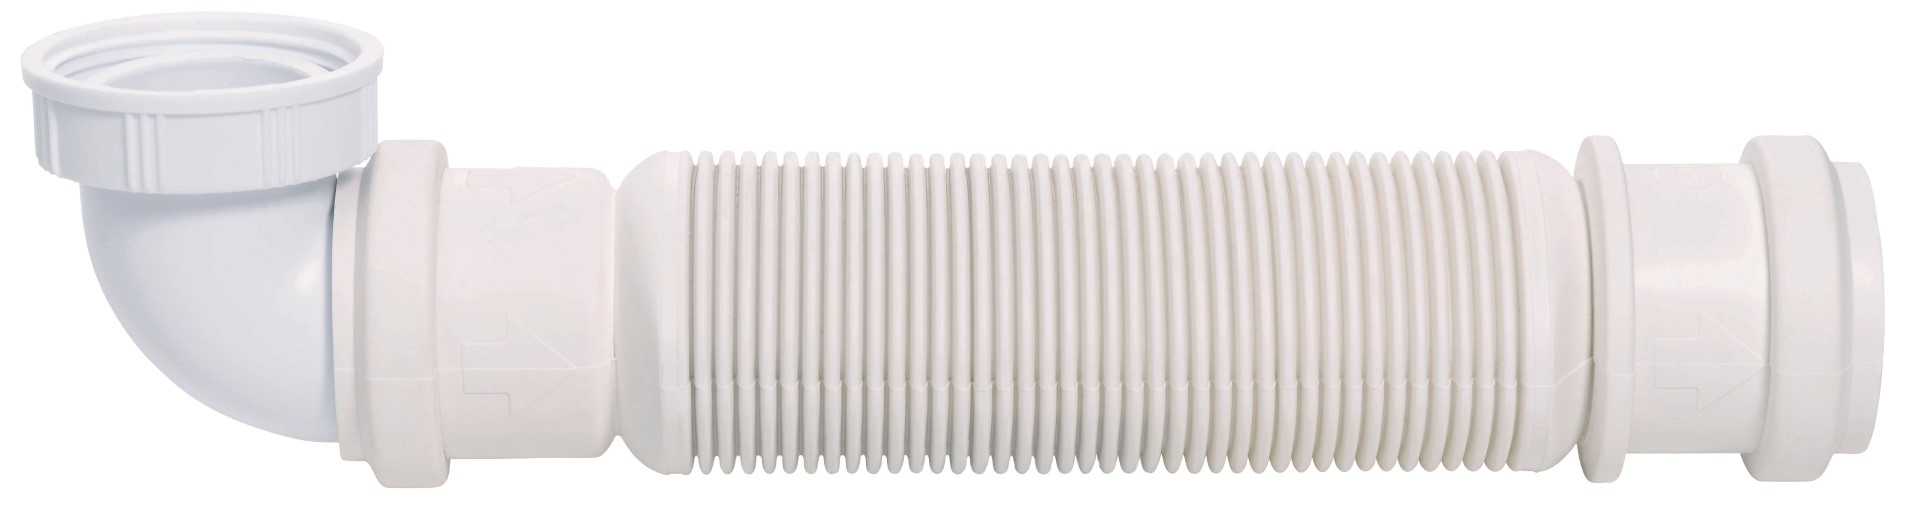 Sifon flexibil chiuveta Wirquin PRO Senzo extra-plat 1 1/2 D40 membrana antimiros poza